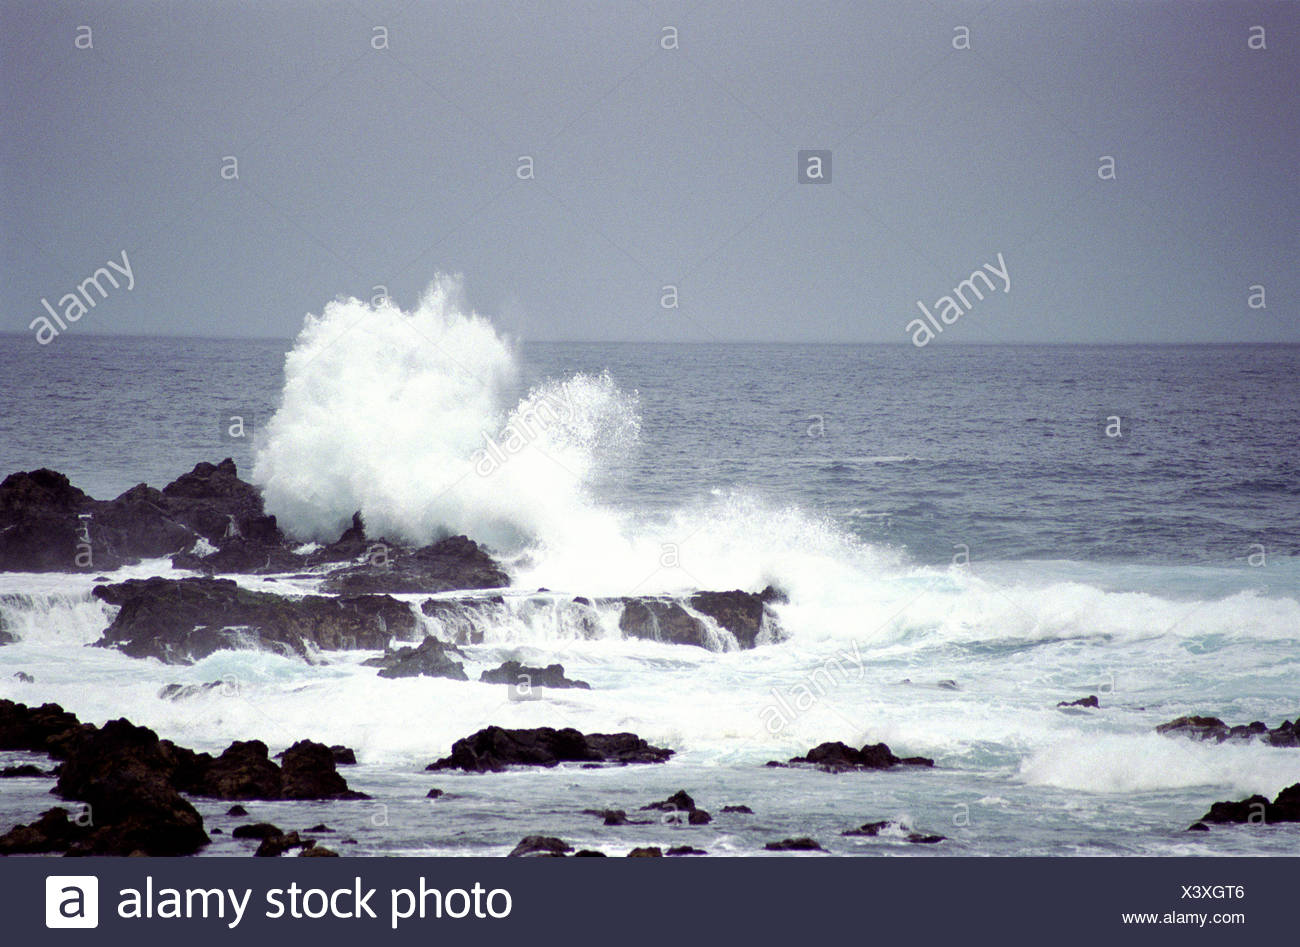 The atlantic sea breaking waves on the rocks - Stock Image